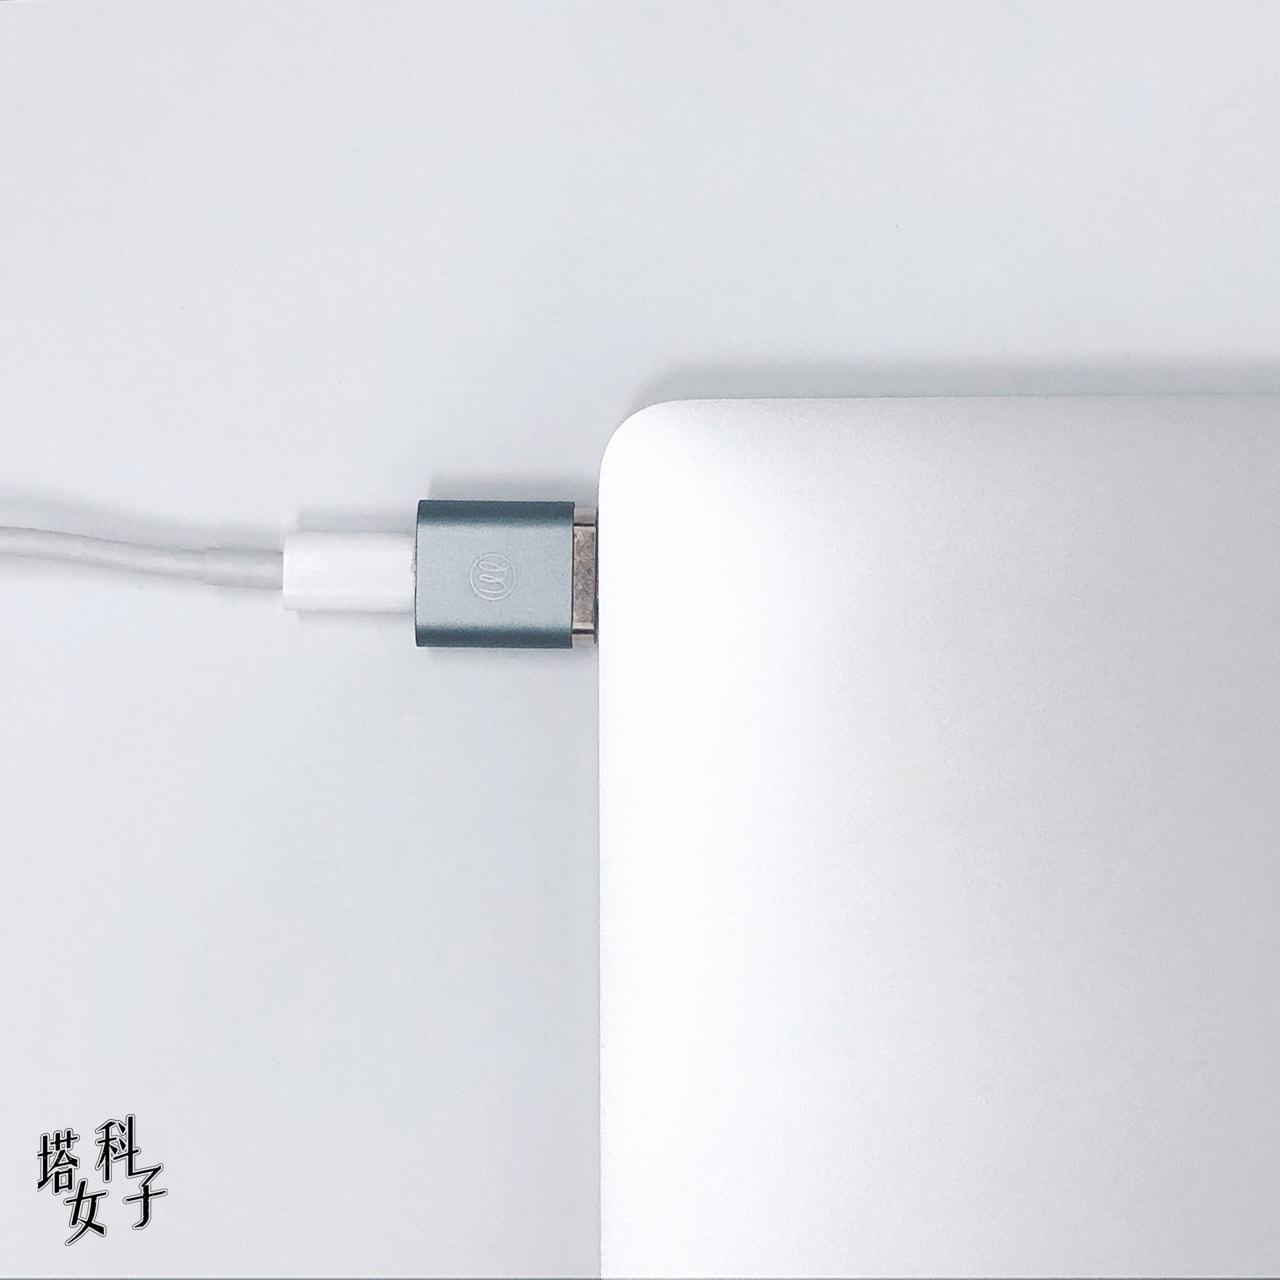 OneMore iEasy USB-C 磁吸轉接頭 MacBook Pro/Air